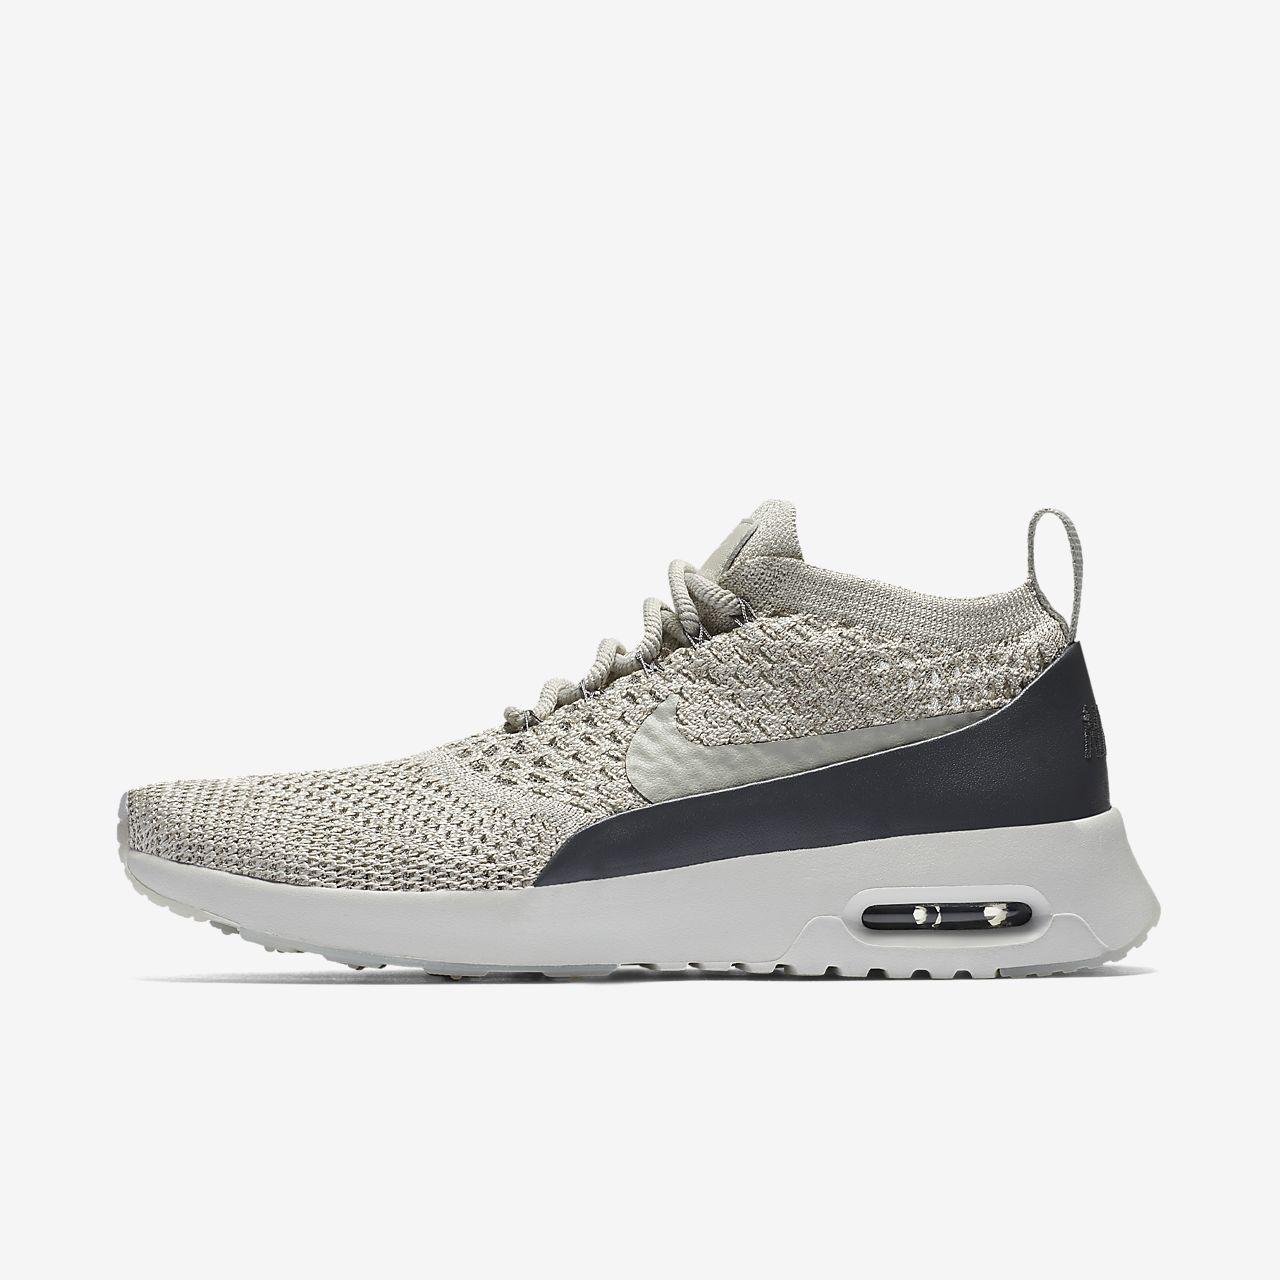 Chaussures À Lacets Jonak Deegan Pour Femme Nike Air Max Thea Ultra